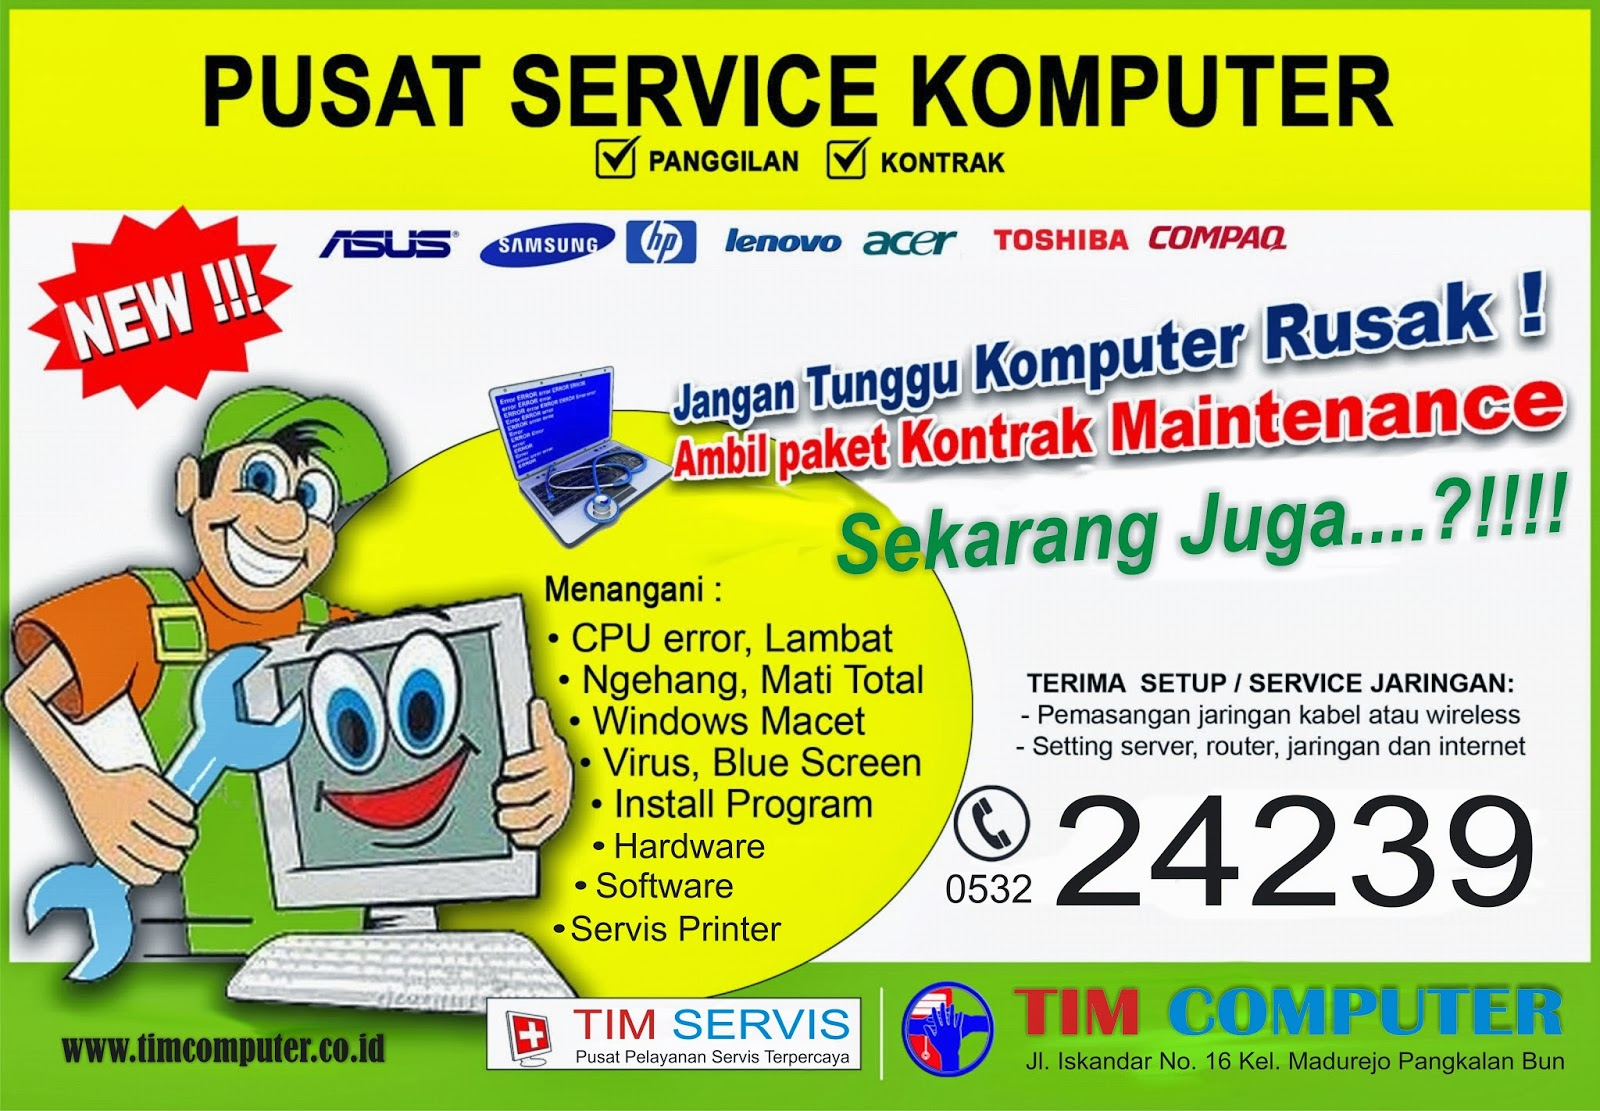 Tim Computer